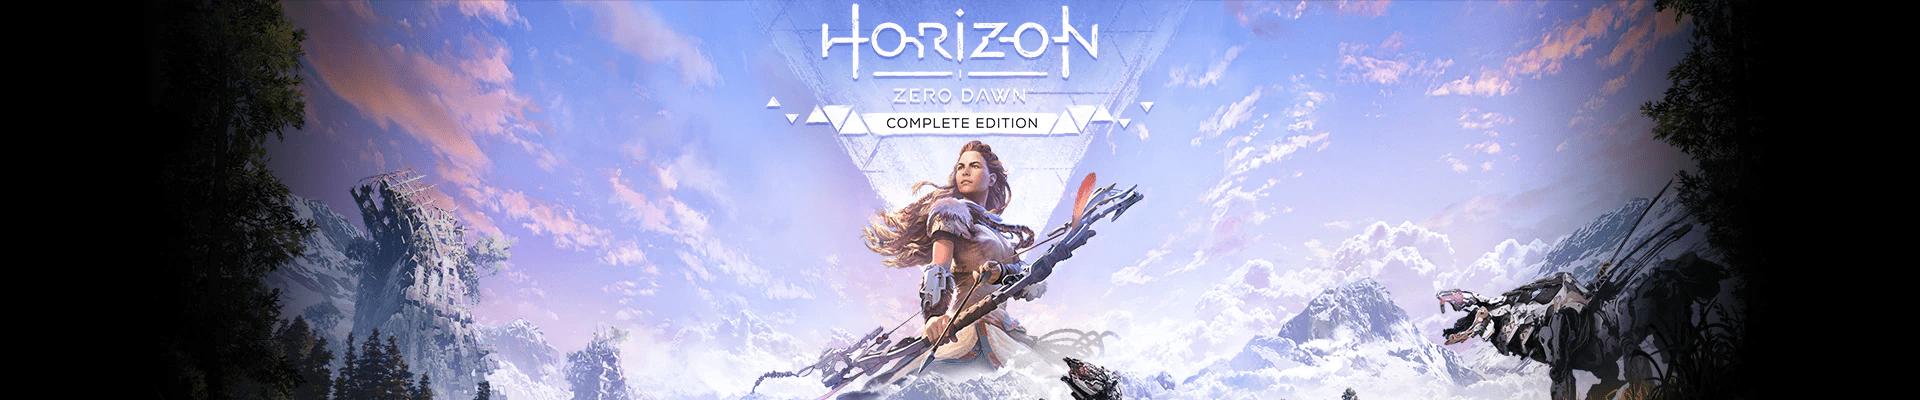 Horizon Zero Dawn Complete Edition + Death Stranding [Активация Игры Steam – Оффлайн Режим]